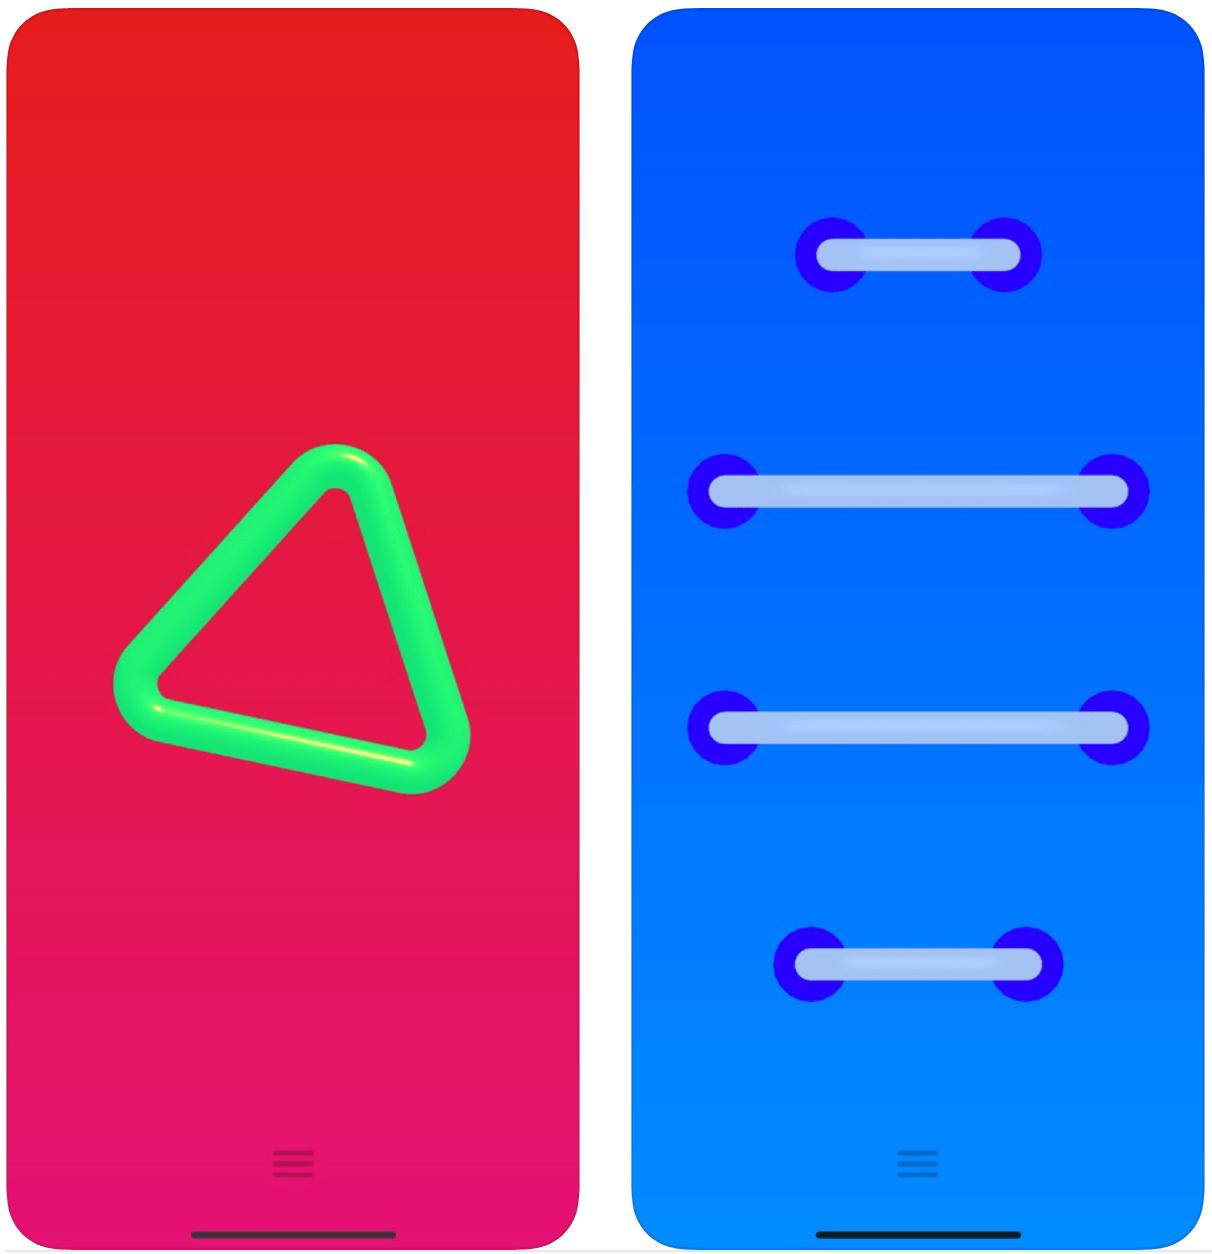 Jam Toys و Cyanite Play و Offscreen وغيرها من التطبيقات للتحقق من هذا الأسبوع 1